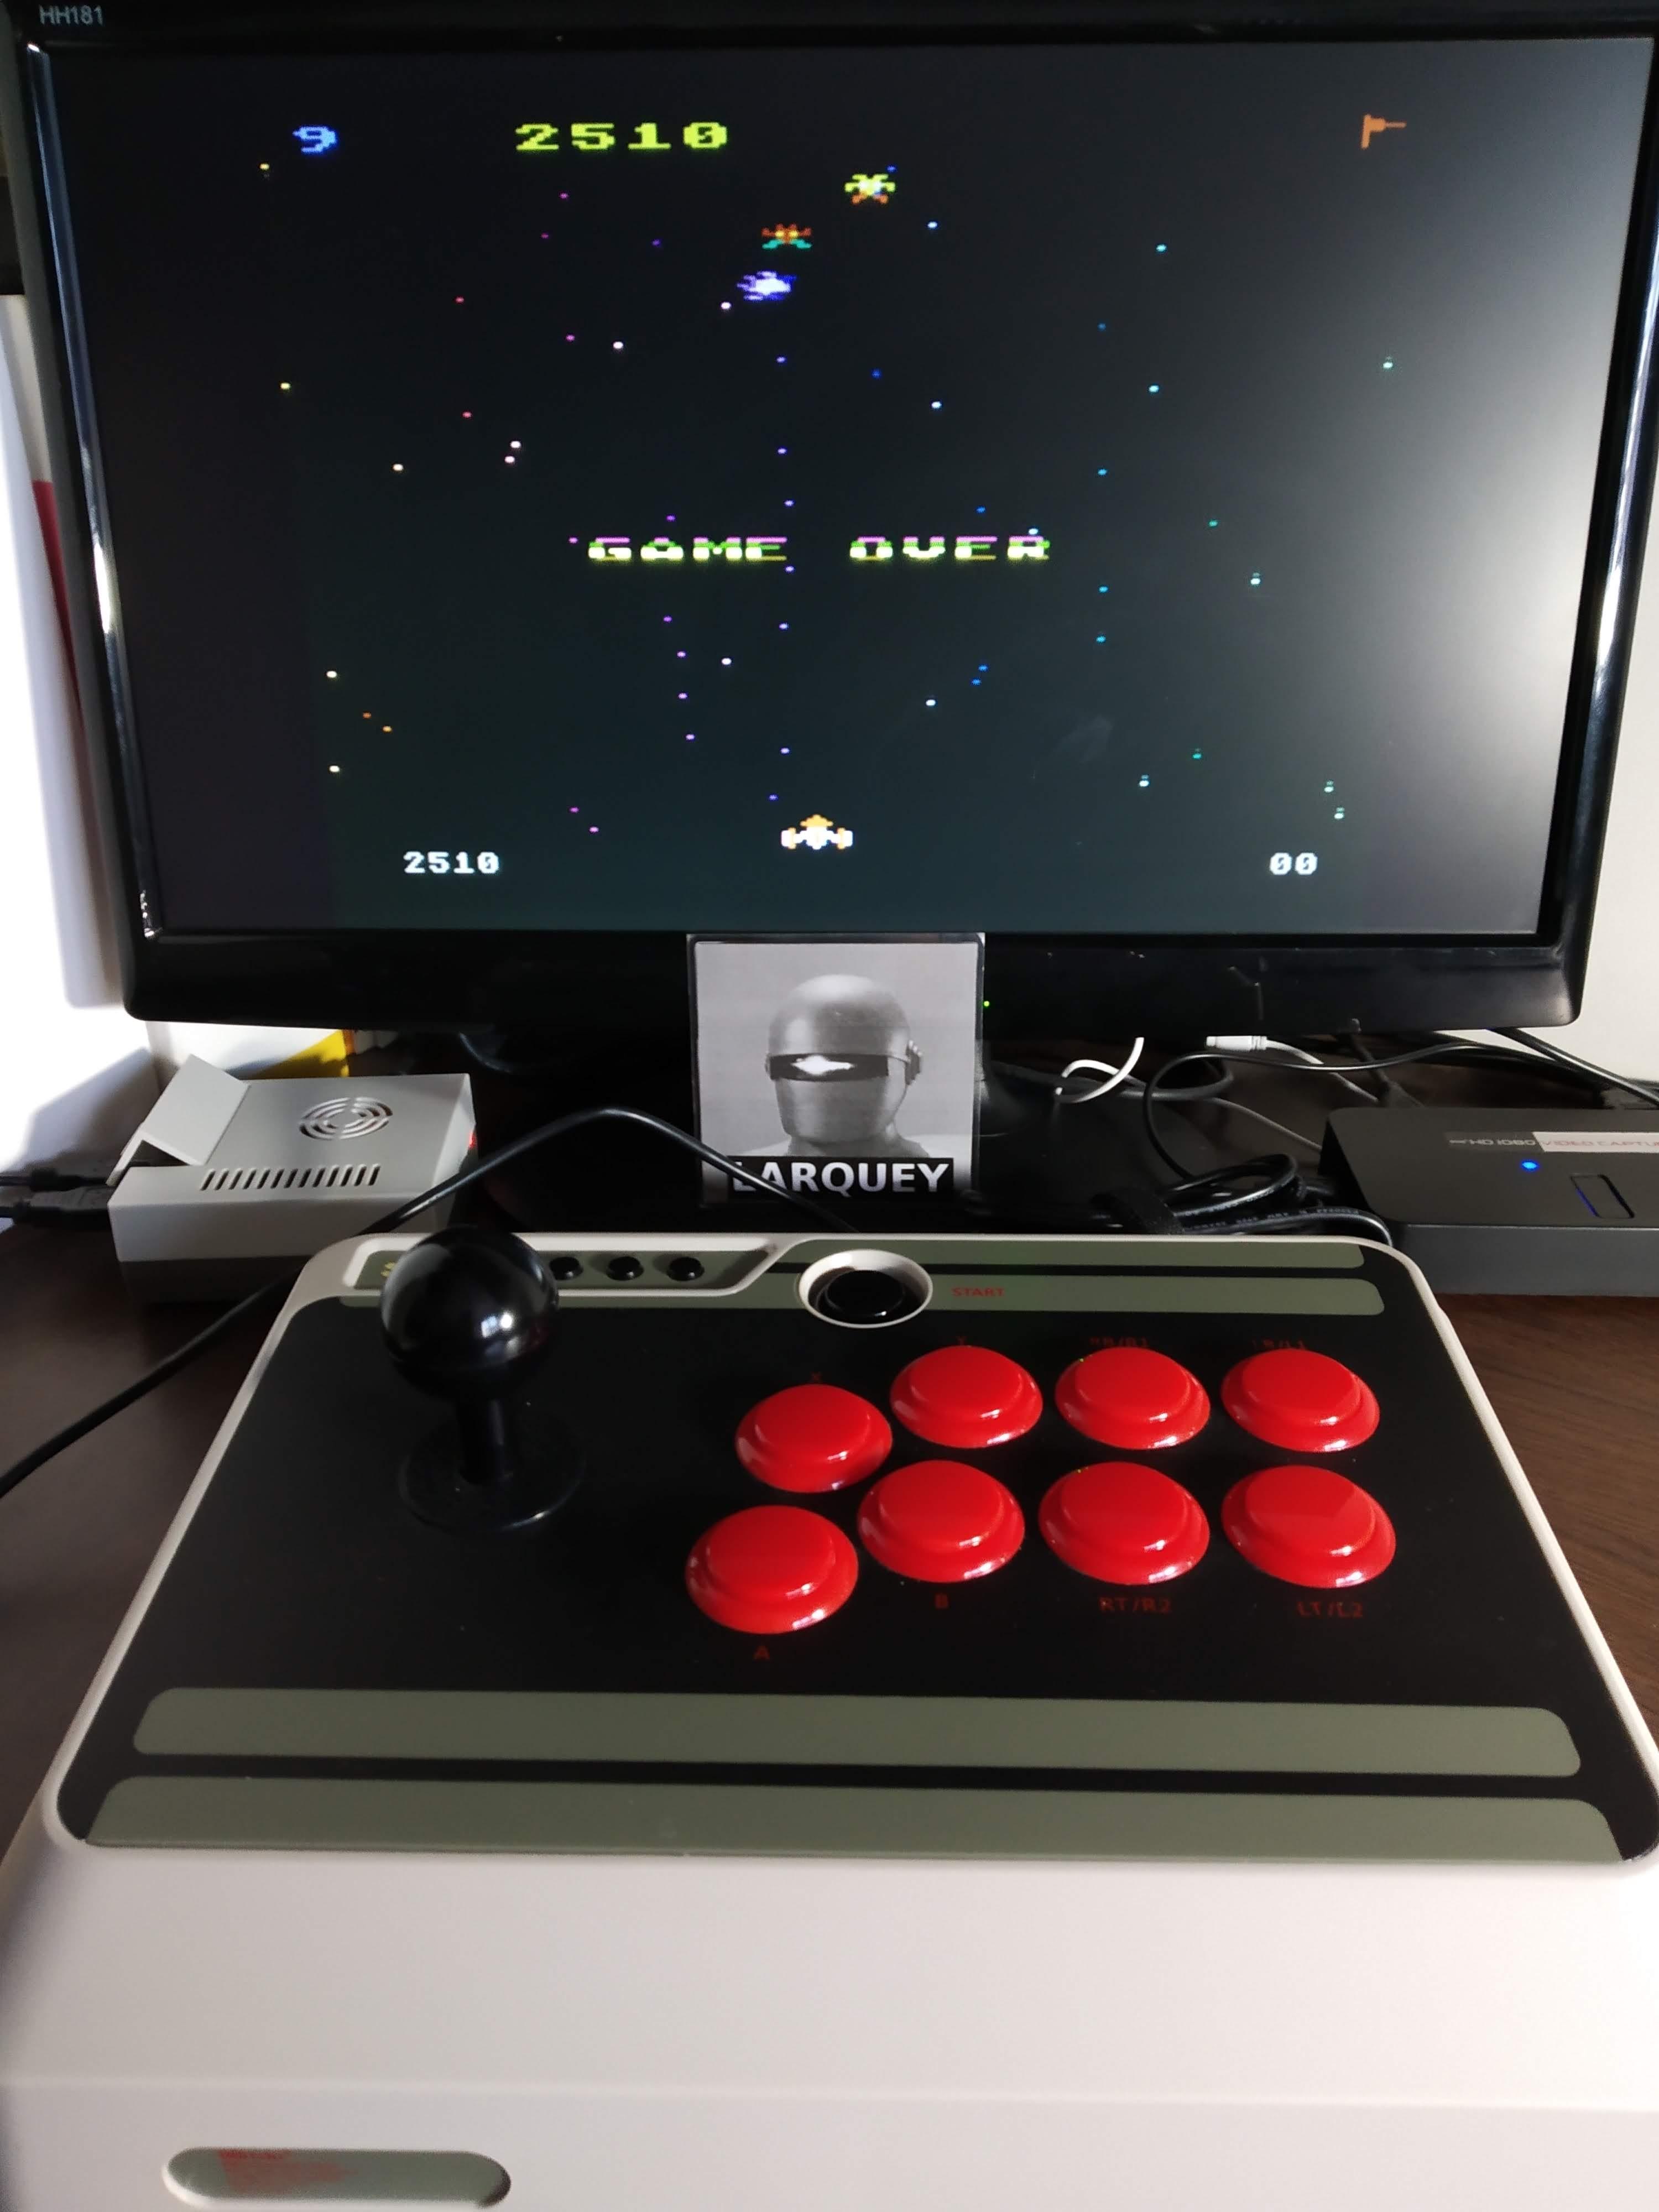 Larquey: Galaxian: Skill Level 9 (Atari 5200 Emulated) 2,510 points on 2019-11-16 07:16:35